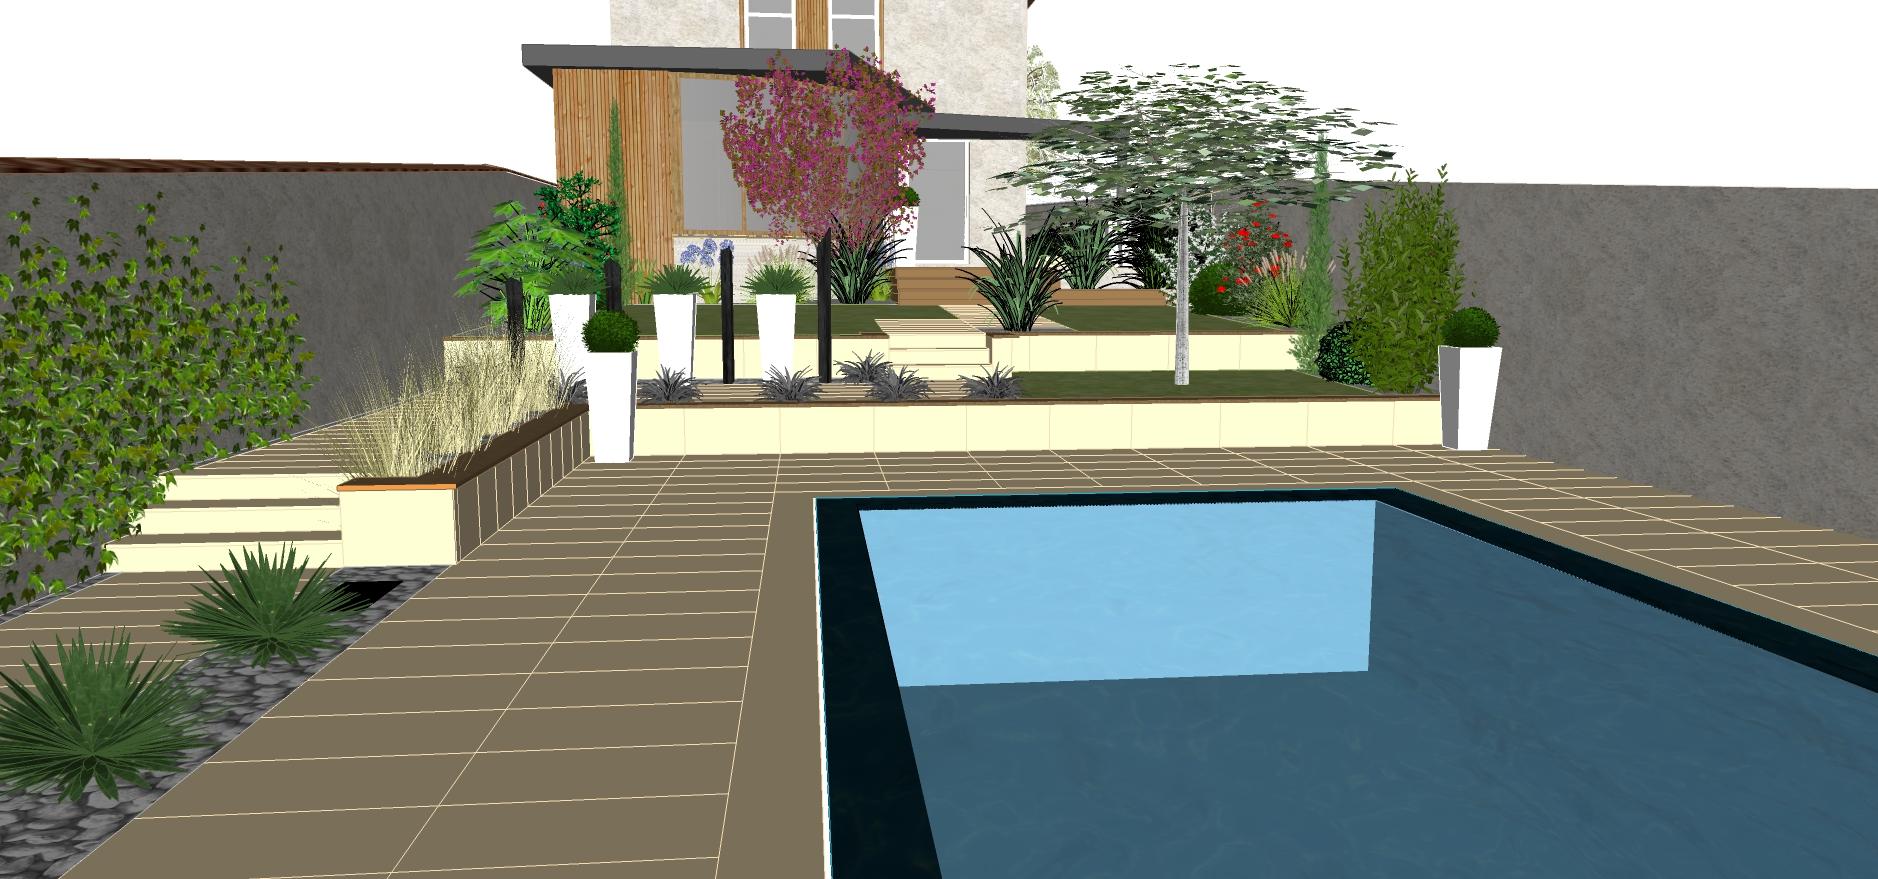 Conception 3d c t jardin for Entretien jardin 34